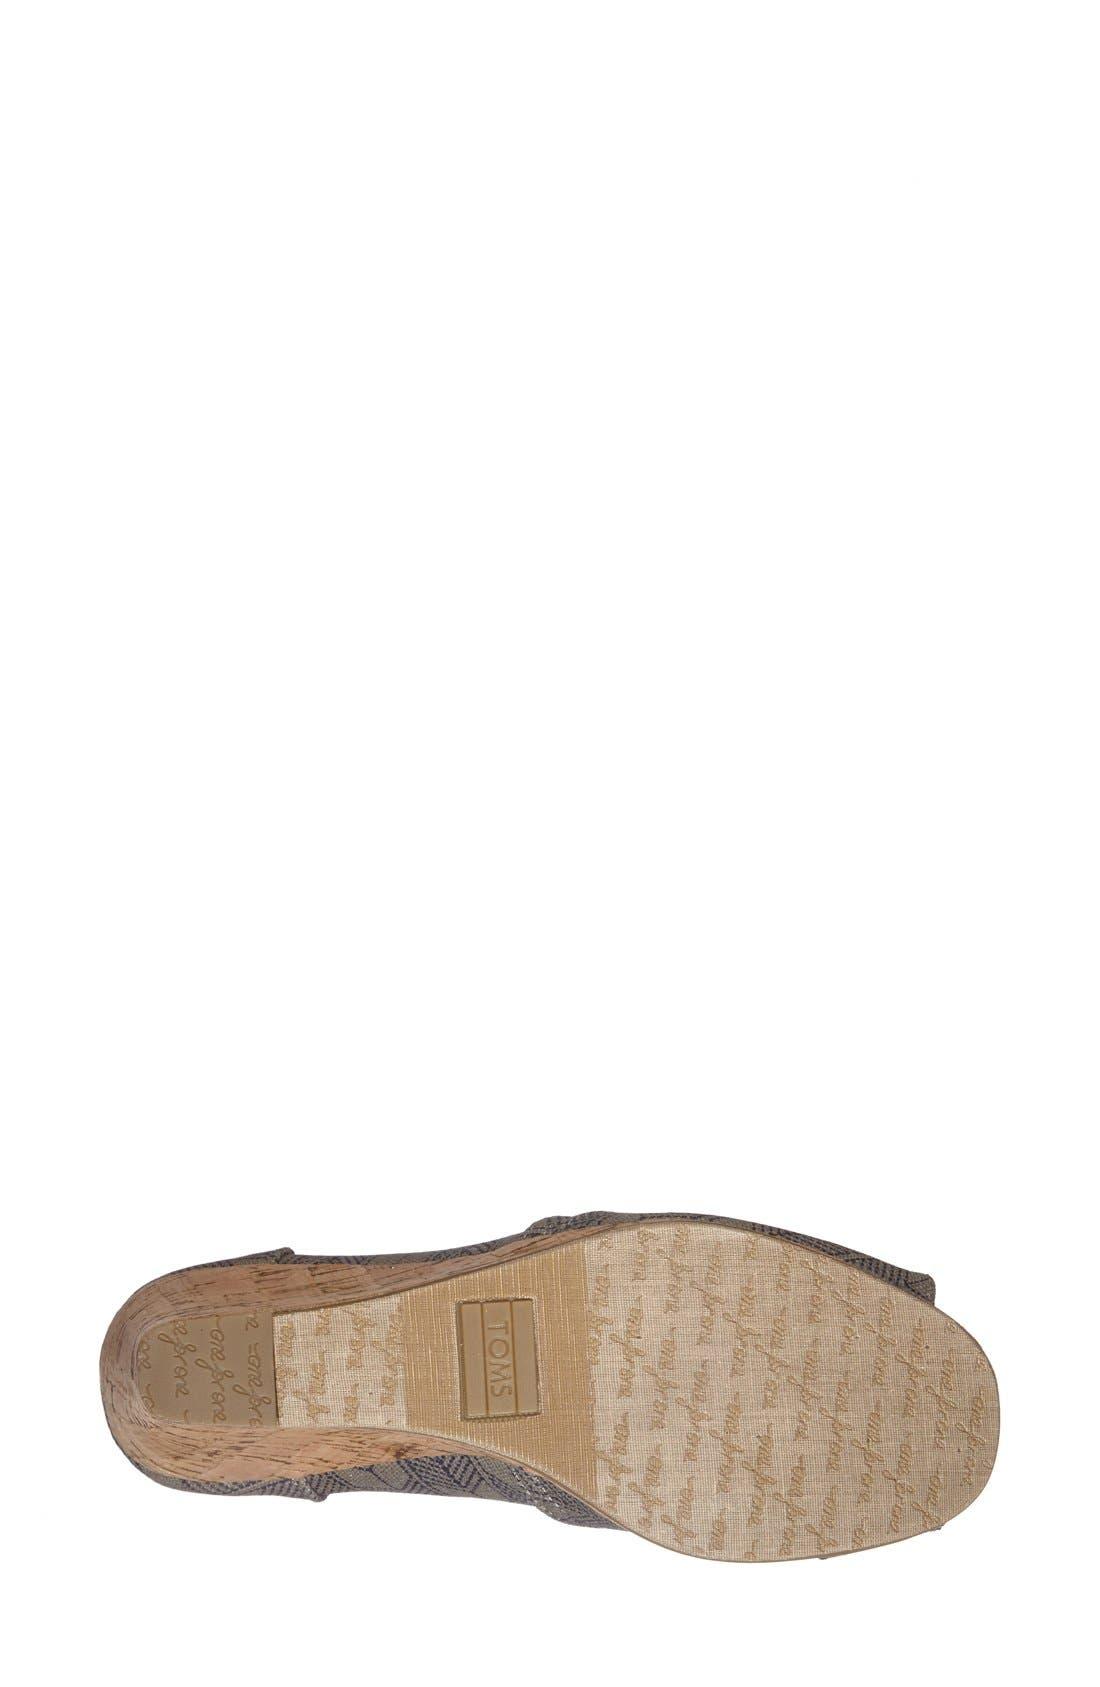 Alternate Image 4  - TOMS 'Classic - Shashiko' Woven Wedge Sandal (Women)